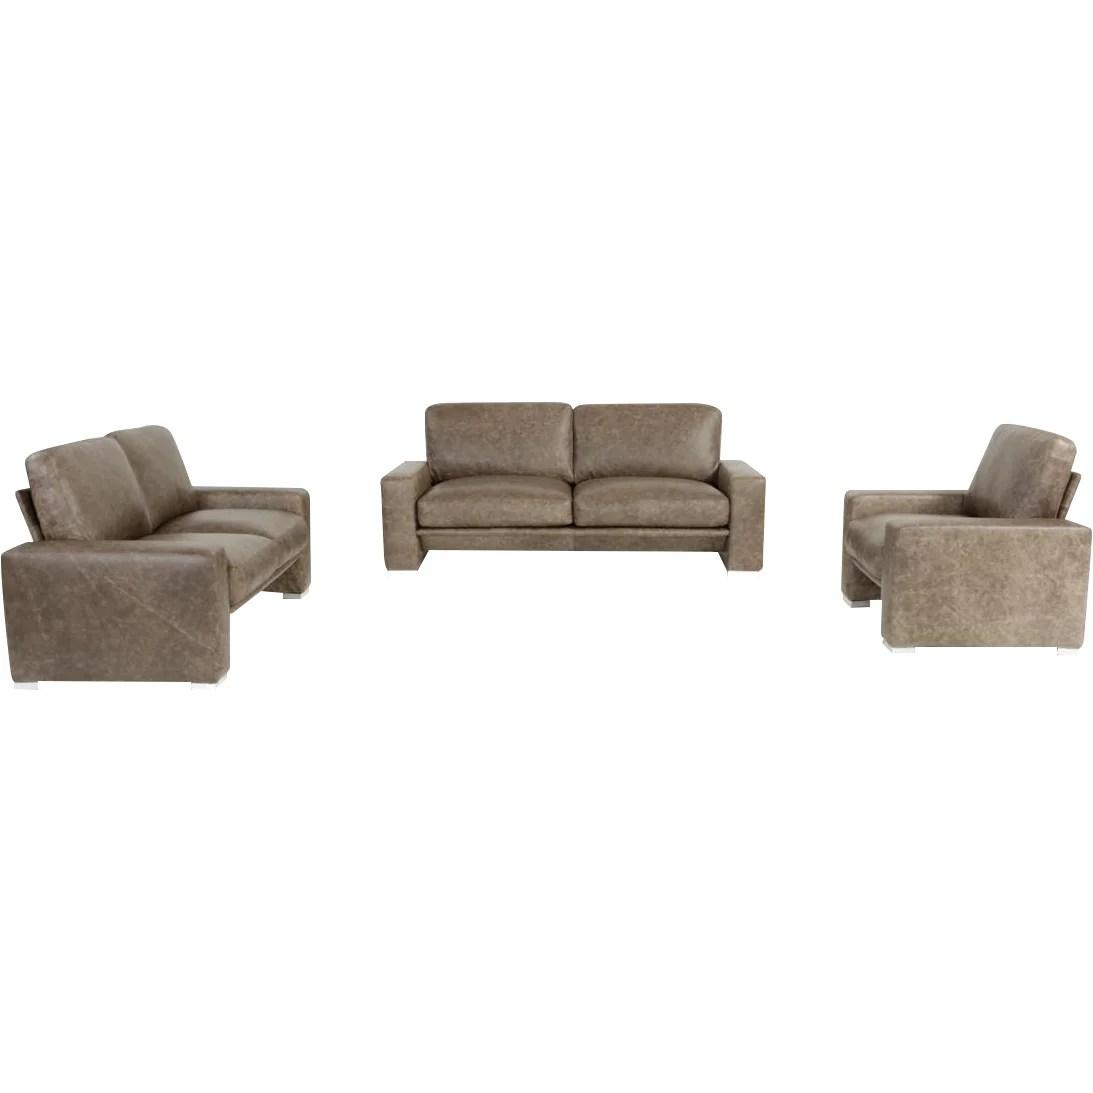 3 piece white leather sofa set tables for living room wade logan northbridge wayfair